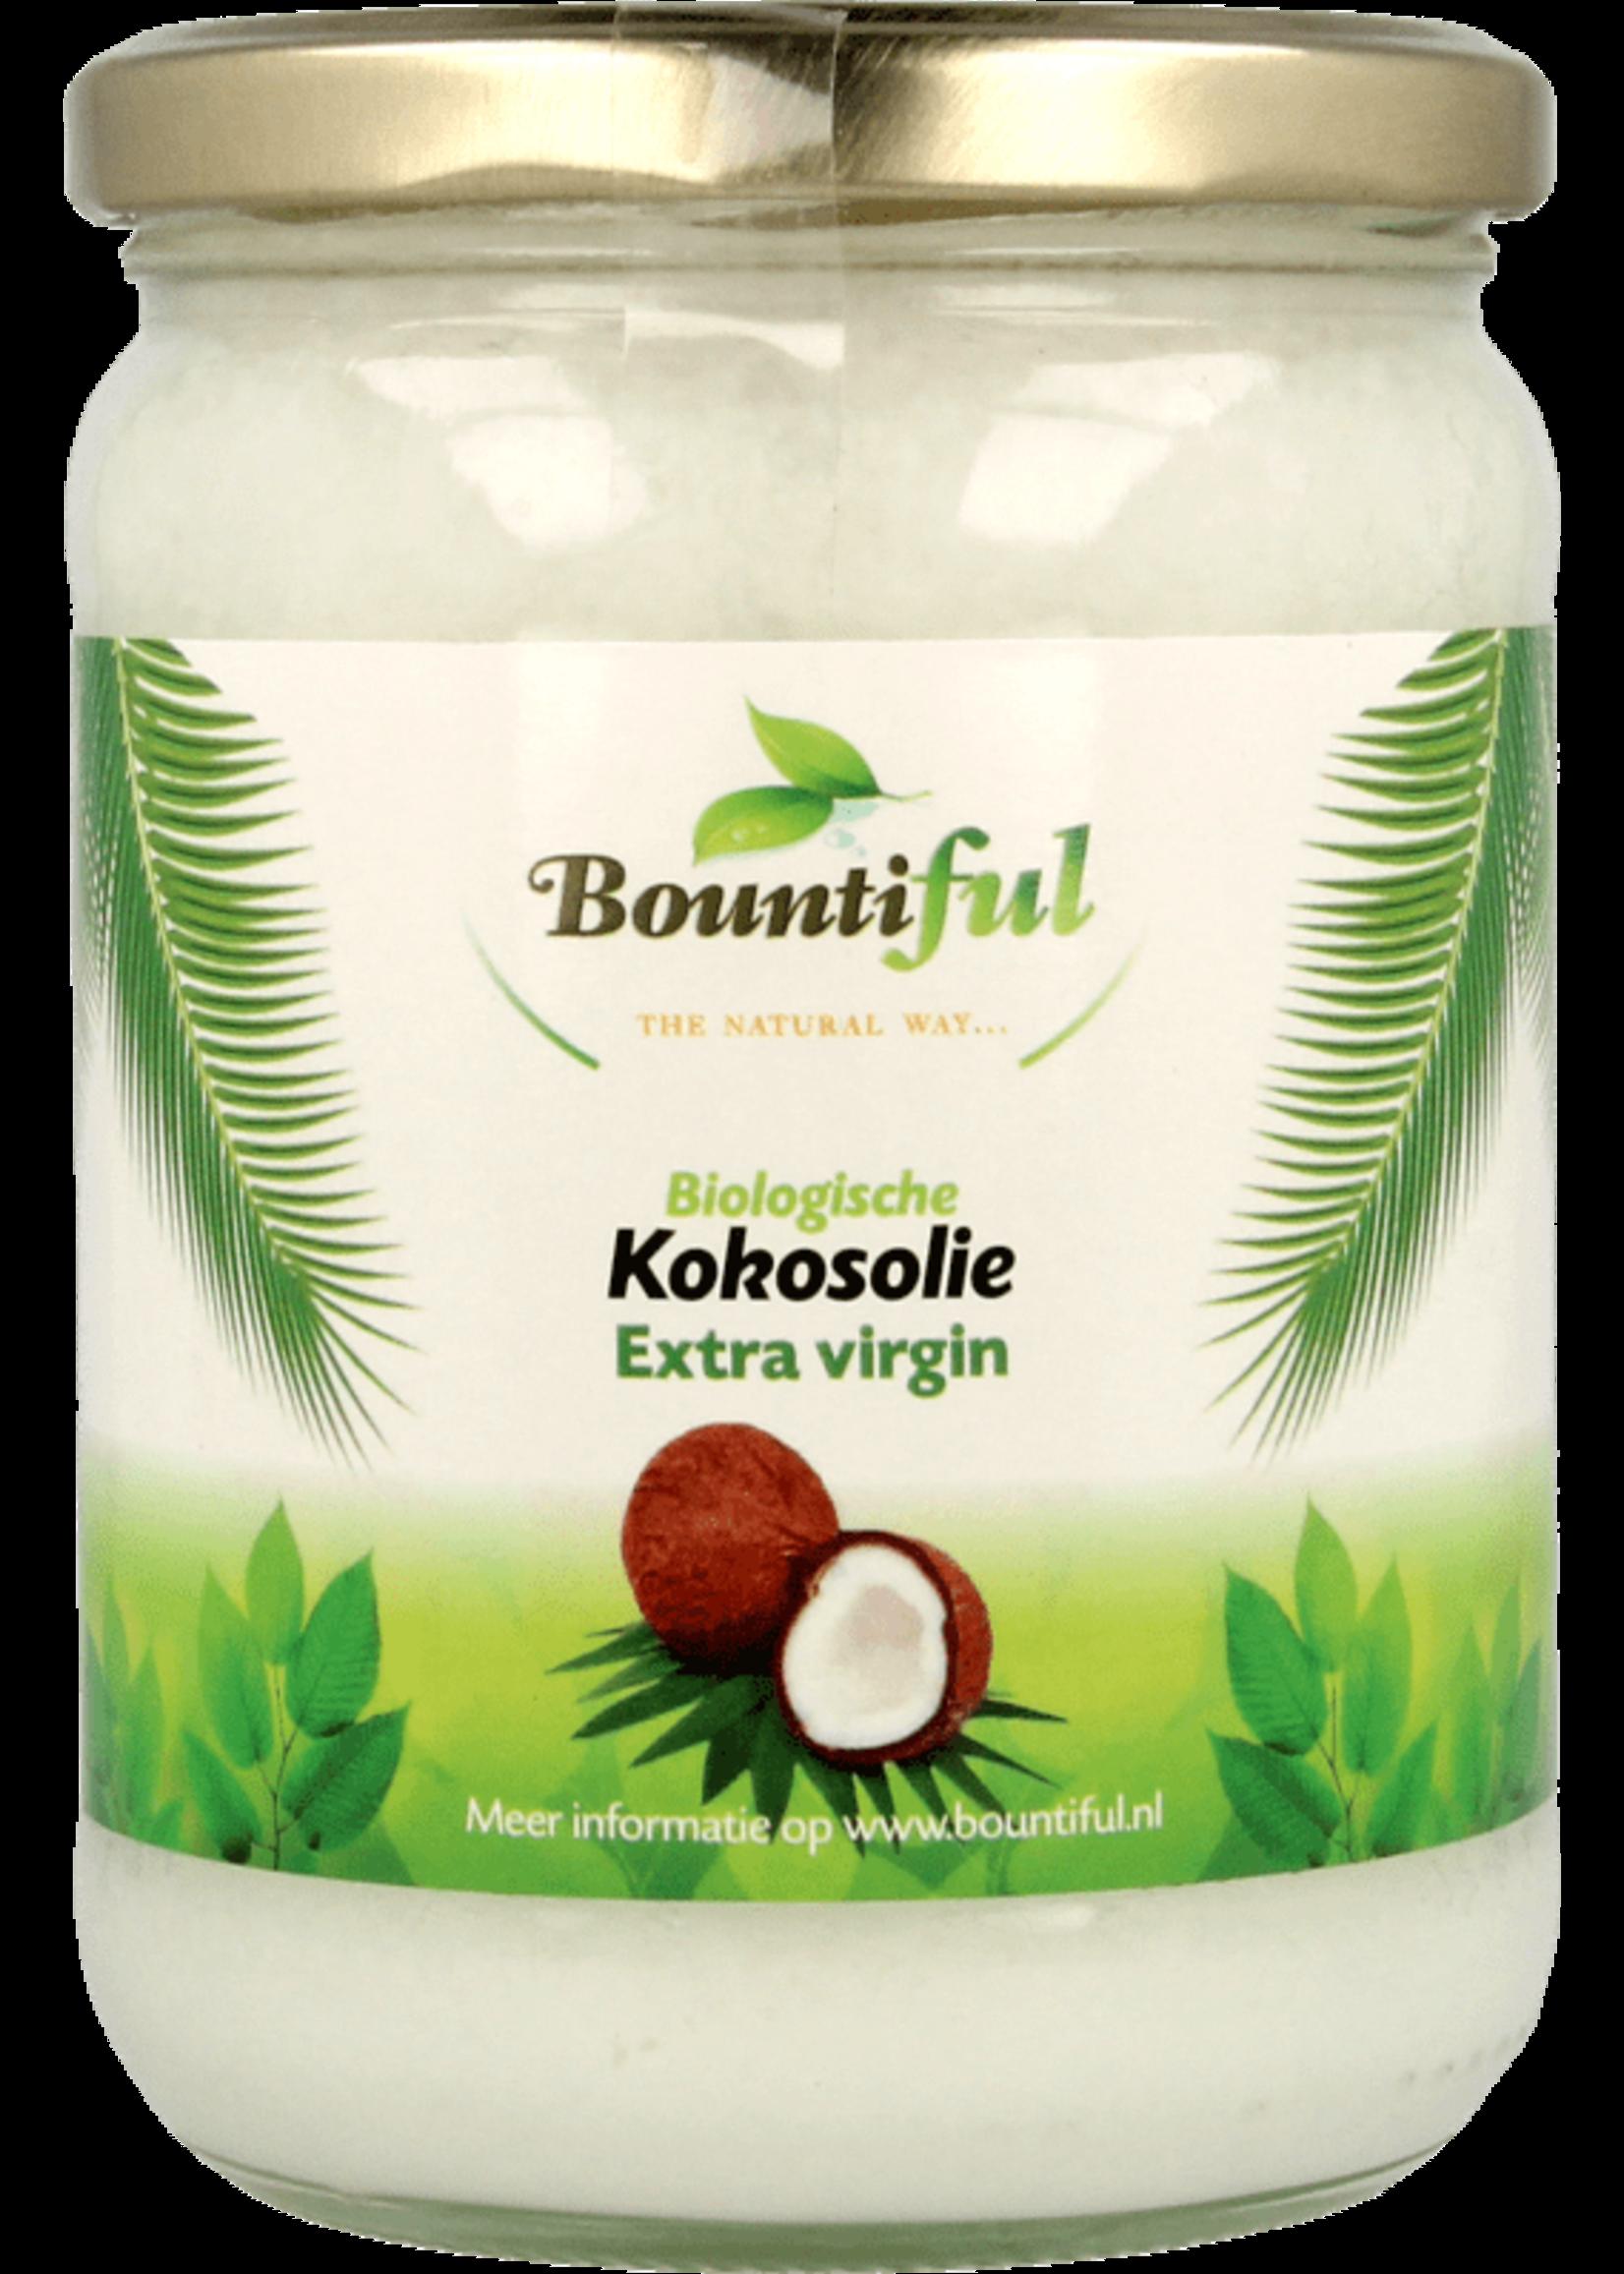 Bountiful Kokosolie Bountiful